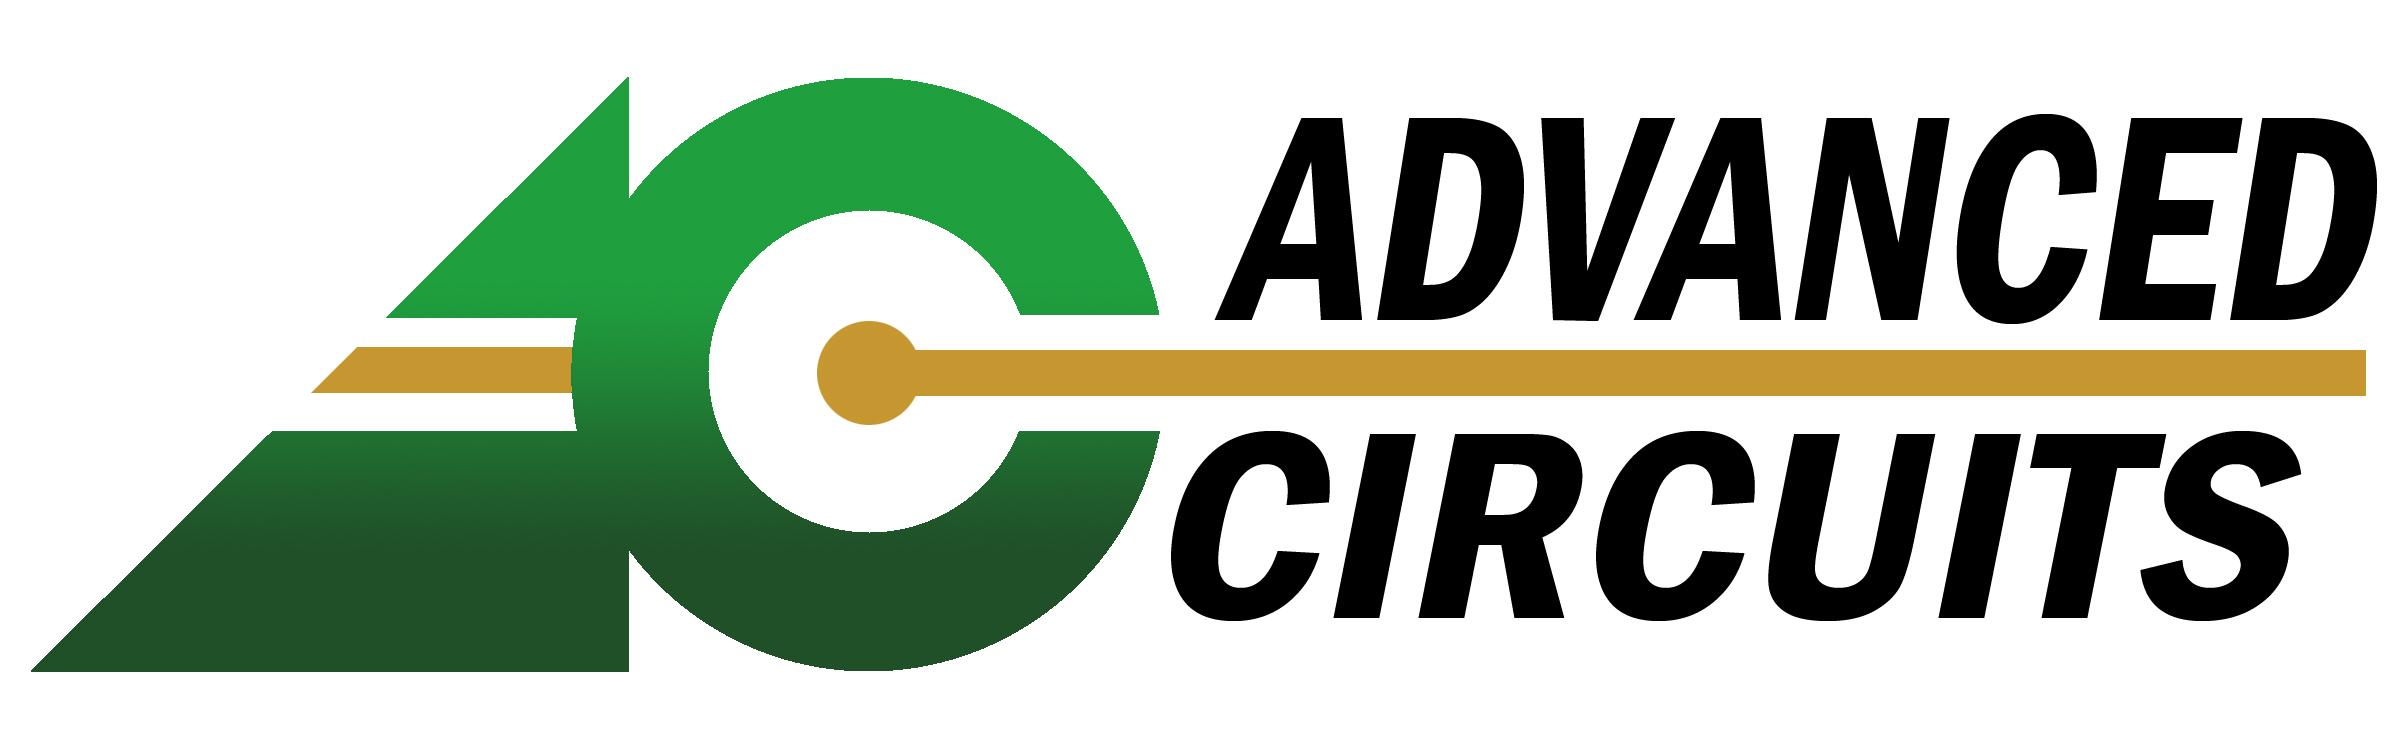 advanced circuits.jpg